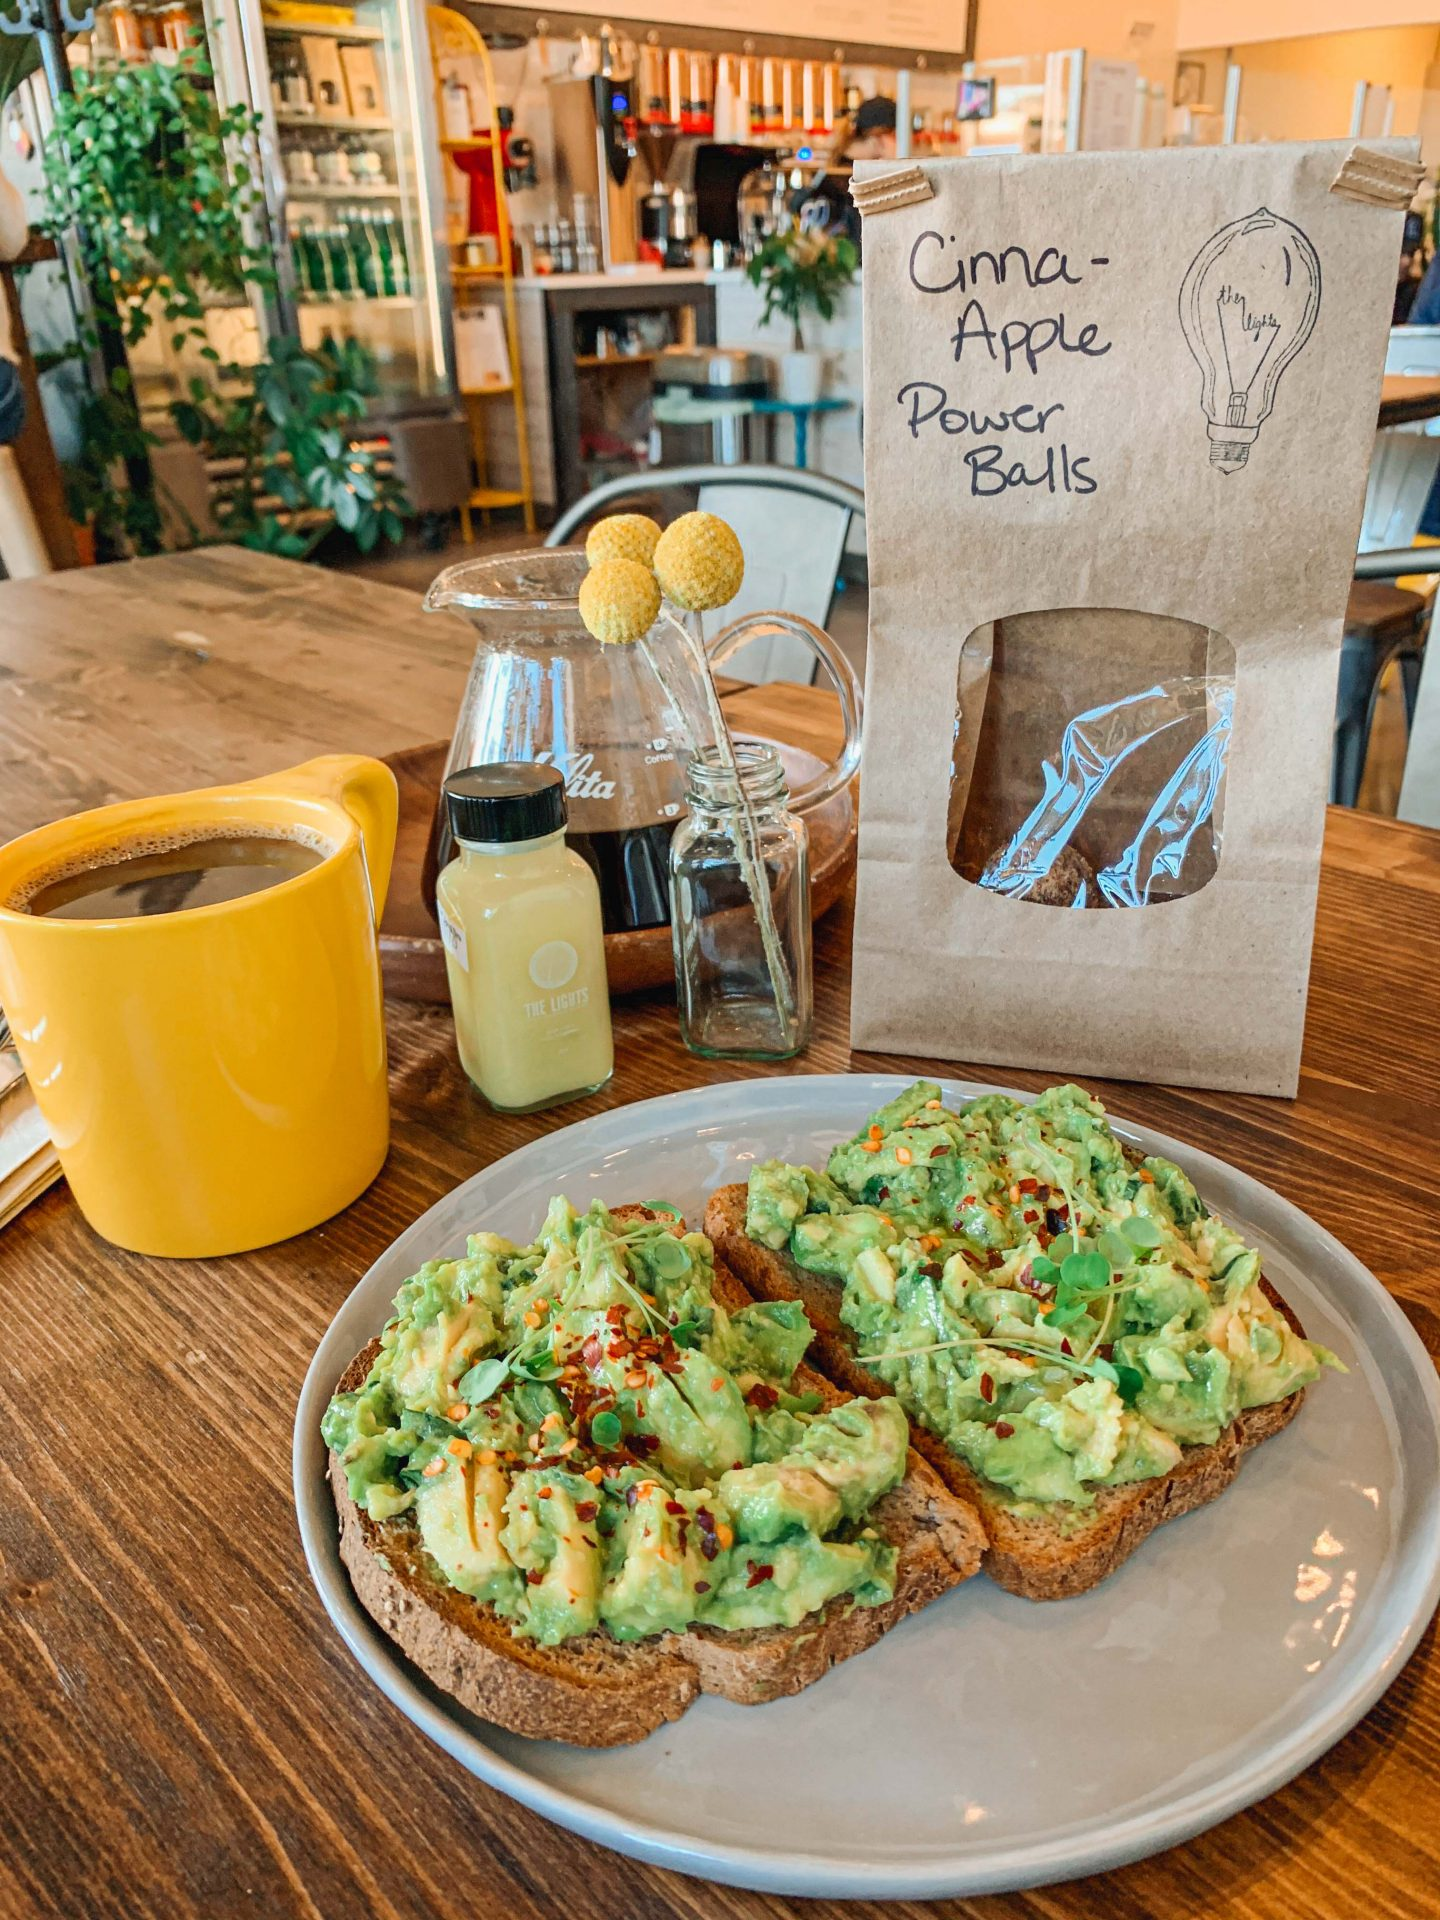 lights juicery, coffee, toast, avocado, healthy eating, Charlotte nc, where to eat, vegan cafe, healthy restaurants Charlotte